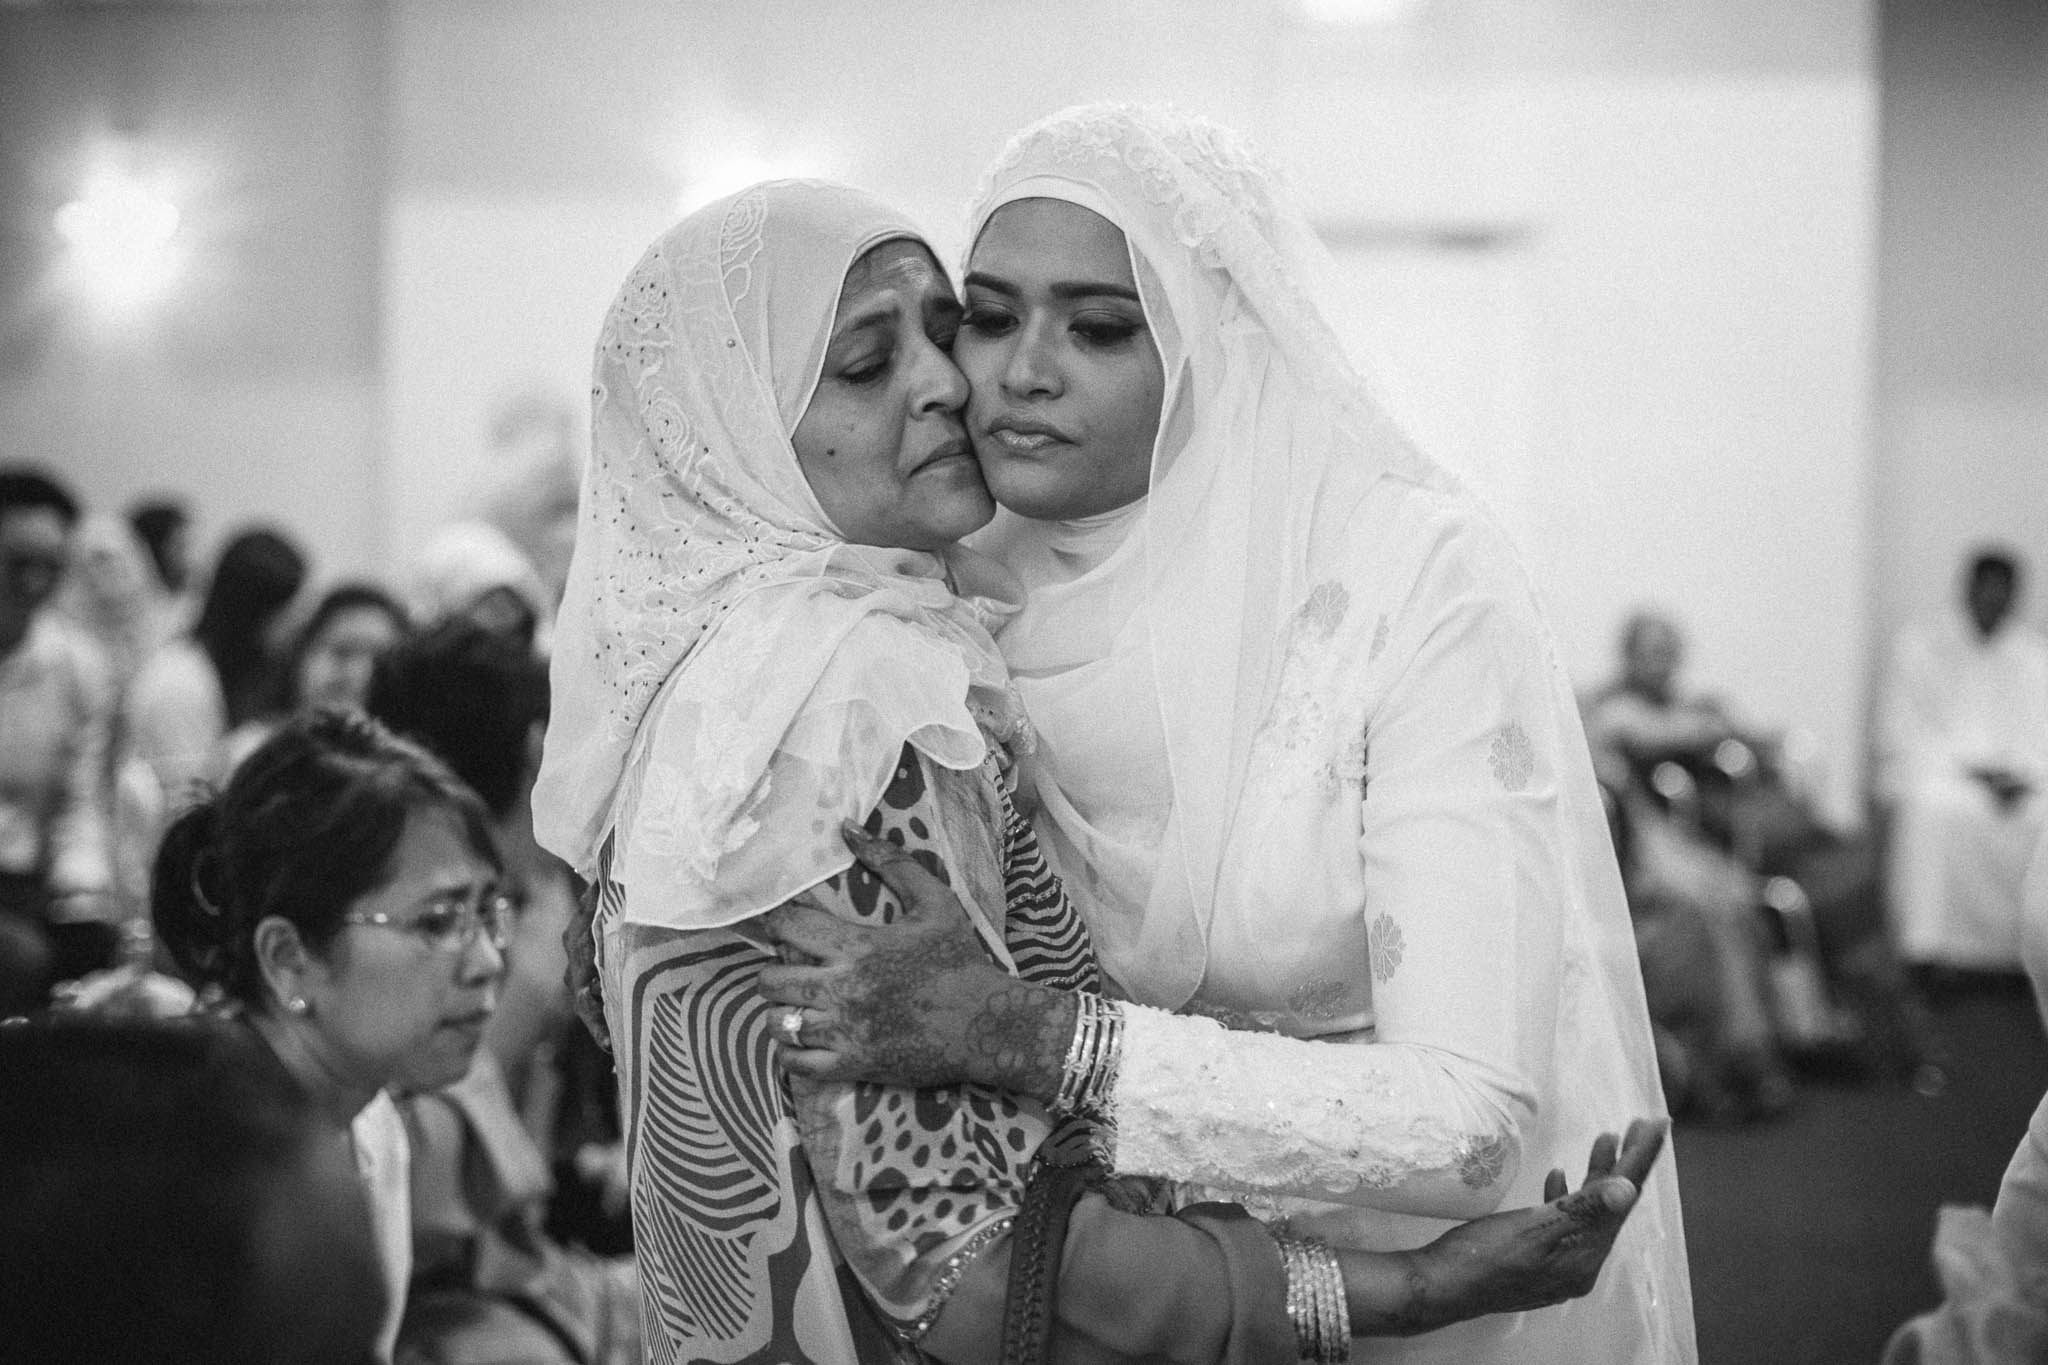 singapore-wedding-photographer-malay-indian-pre-wedding-travel-wmt-2015-shereen-farid-32.jpg